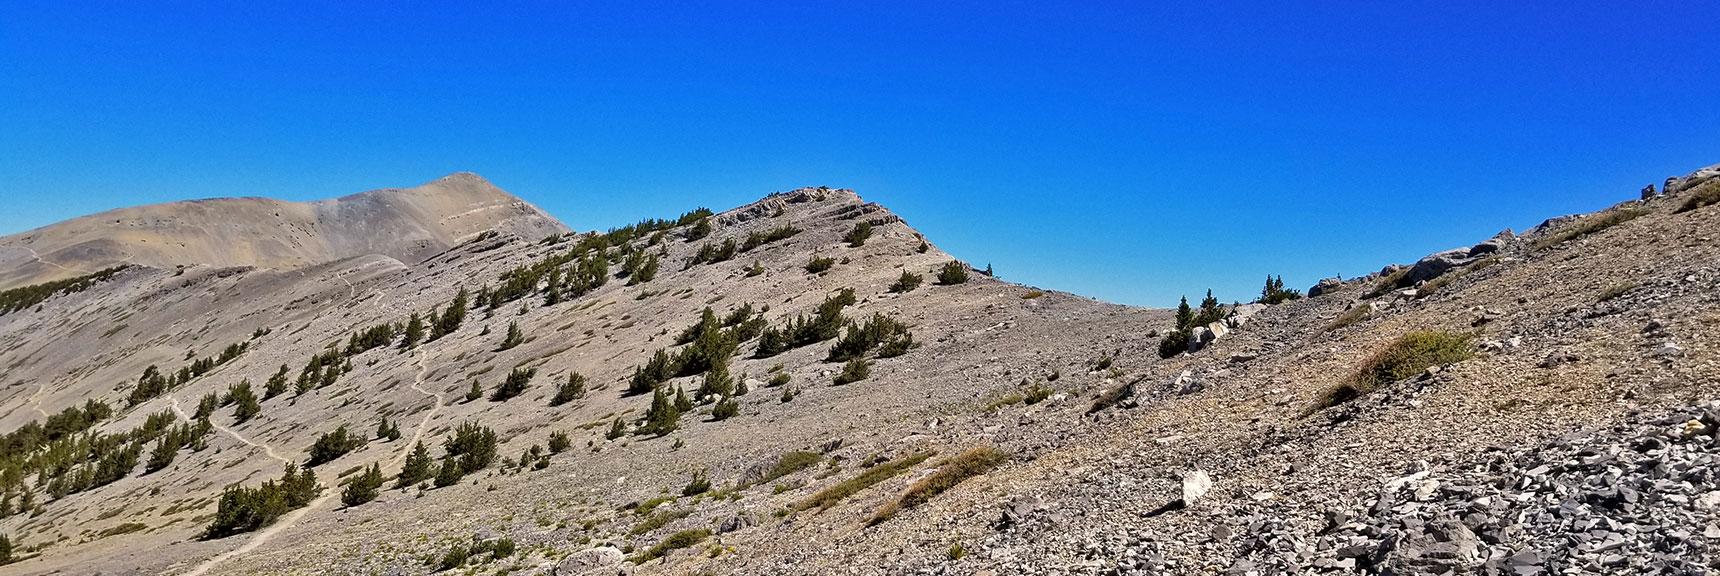 Kyle Canyon Upper South Ridge to Charleston Peak from Saddle | Griffith Peak & Charleston Peak Circuit Run, Spring Mountains, Nevada